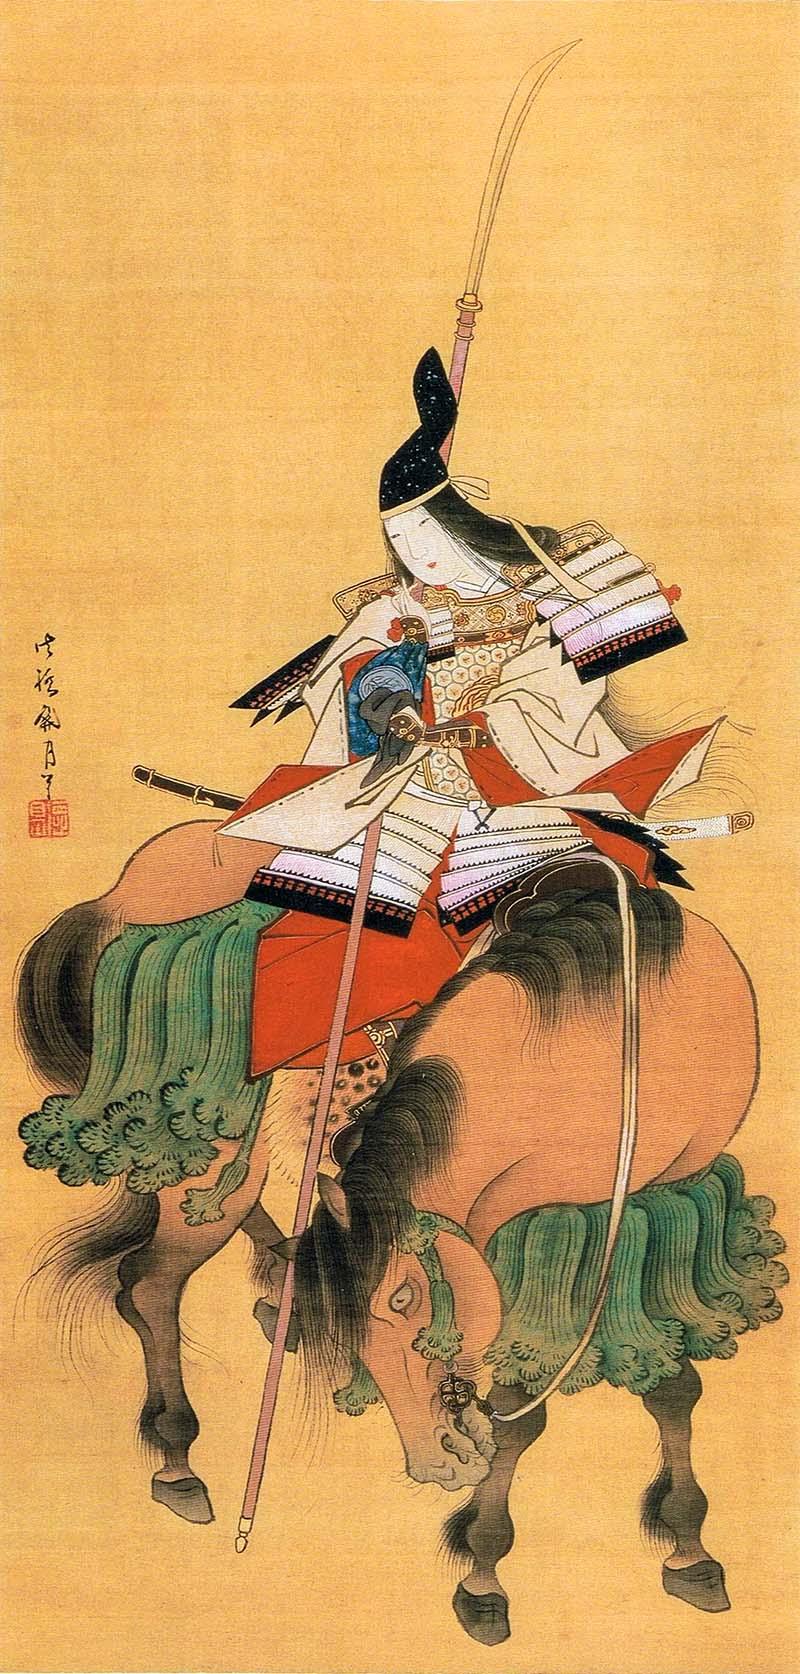 samurai-6-800x400